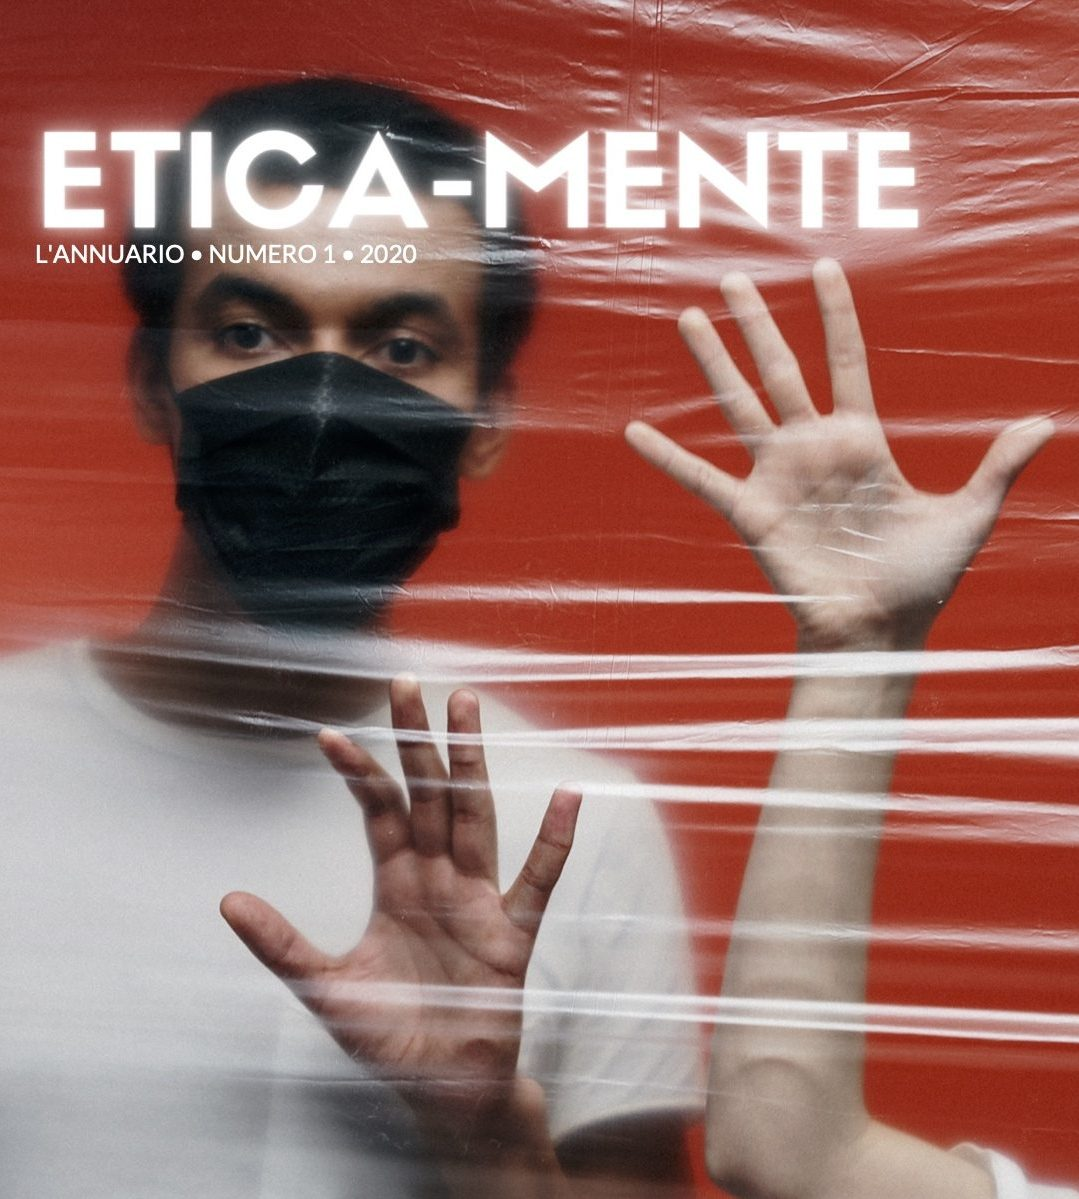 Etica-mente. Magazine